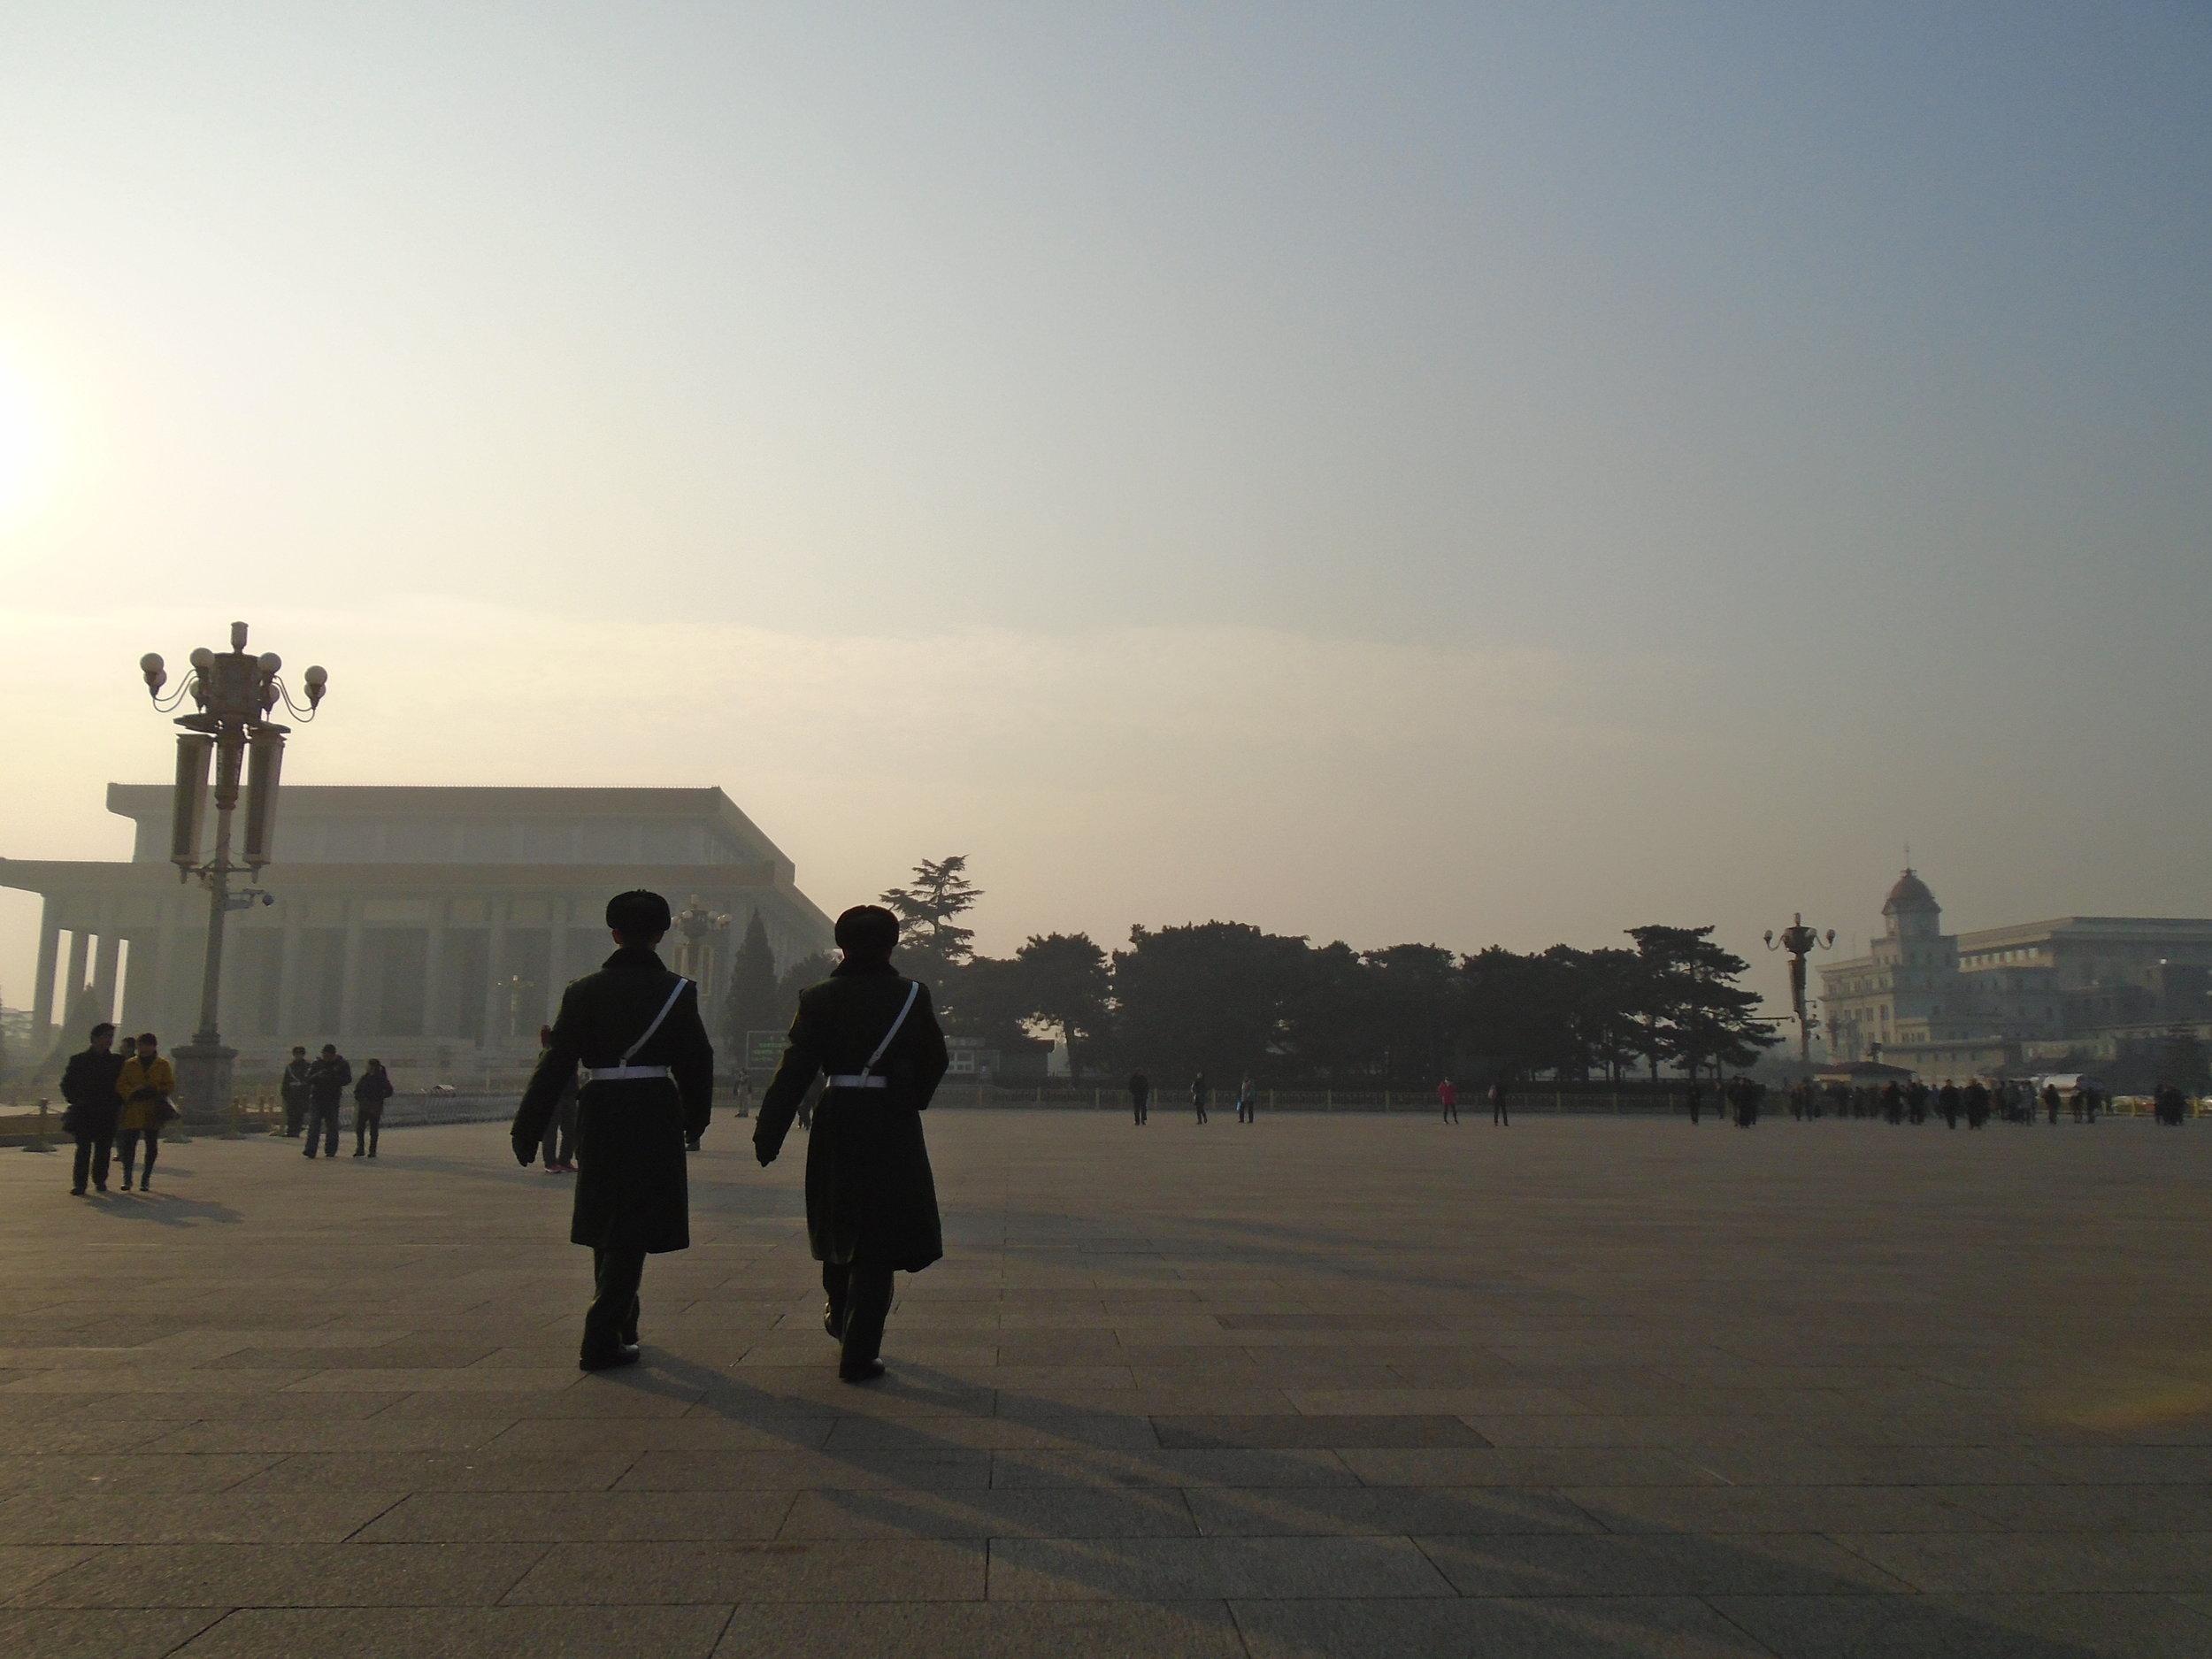 Guards_in_Tiananmen_Square.jpg